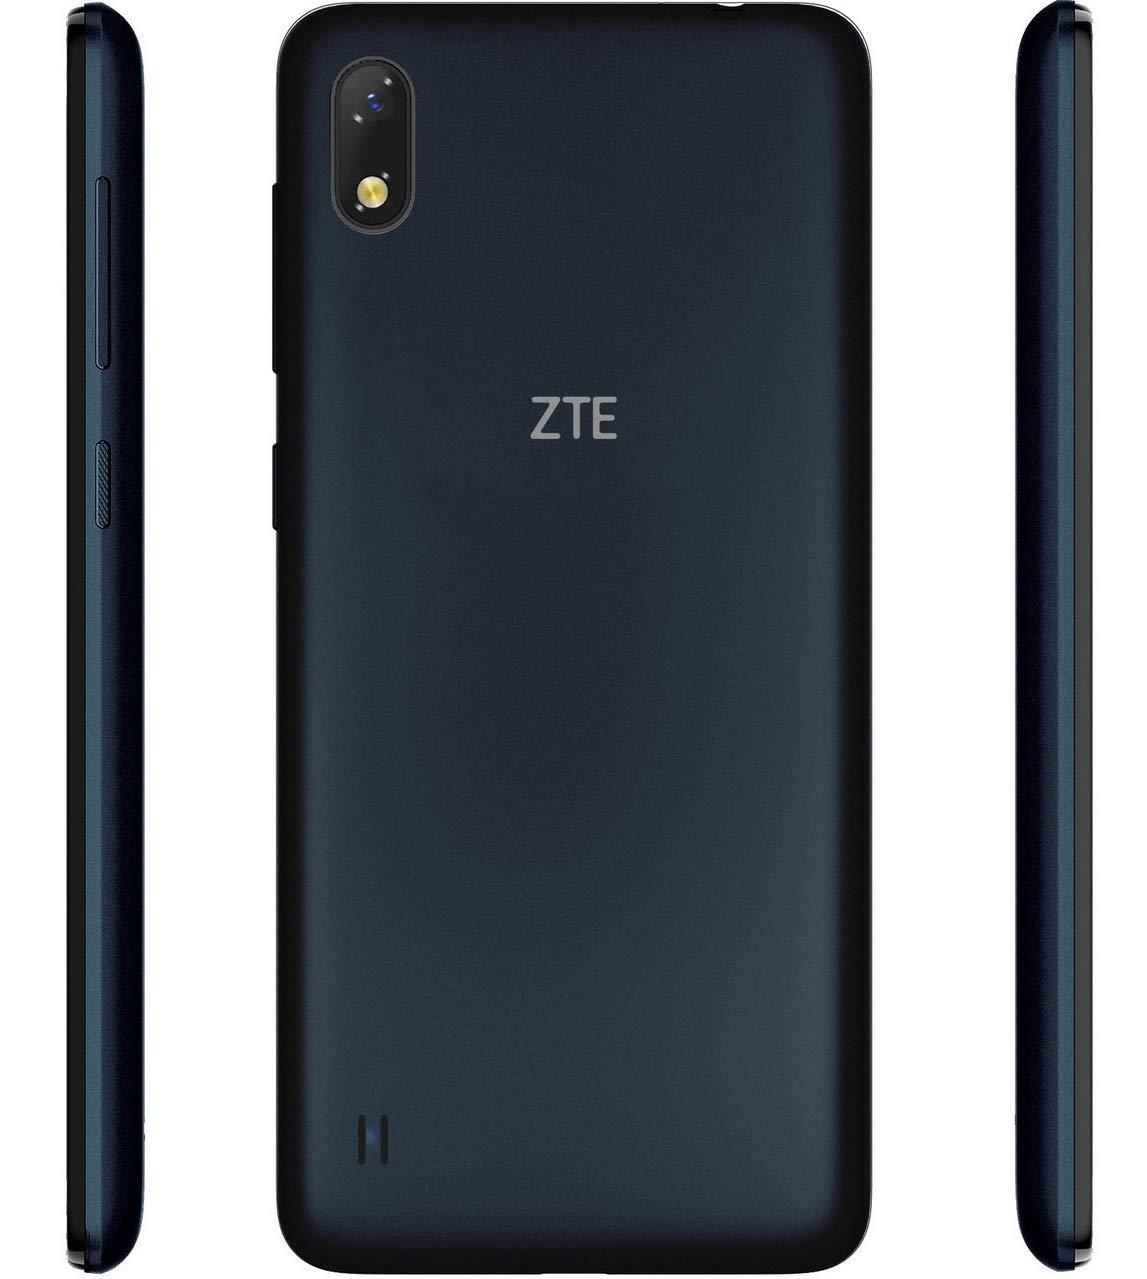 Amazon.com: ZTE Blade A530 5